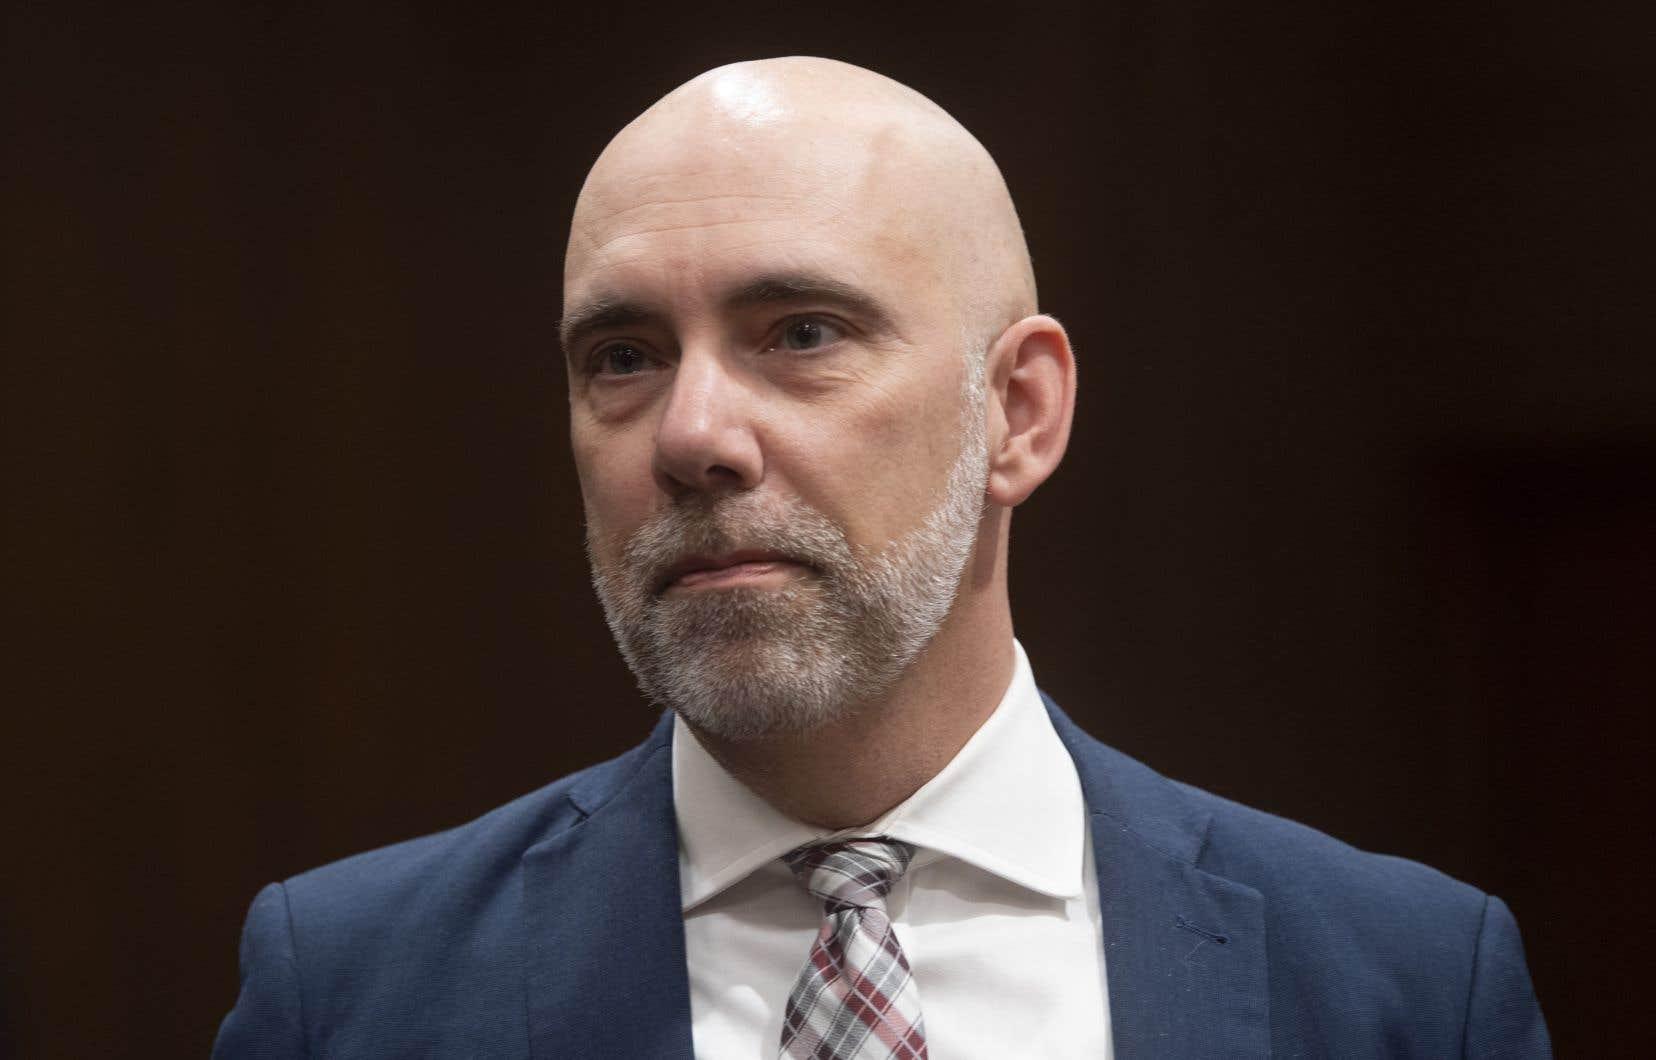 Ledirecteur parlementaire du budget, Yves Giroux